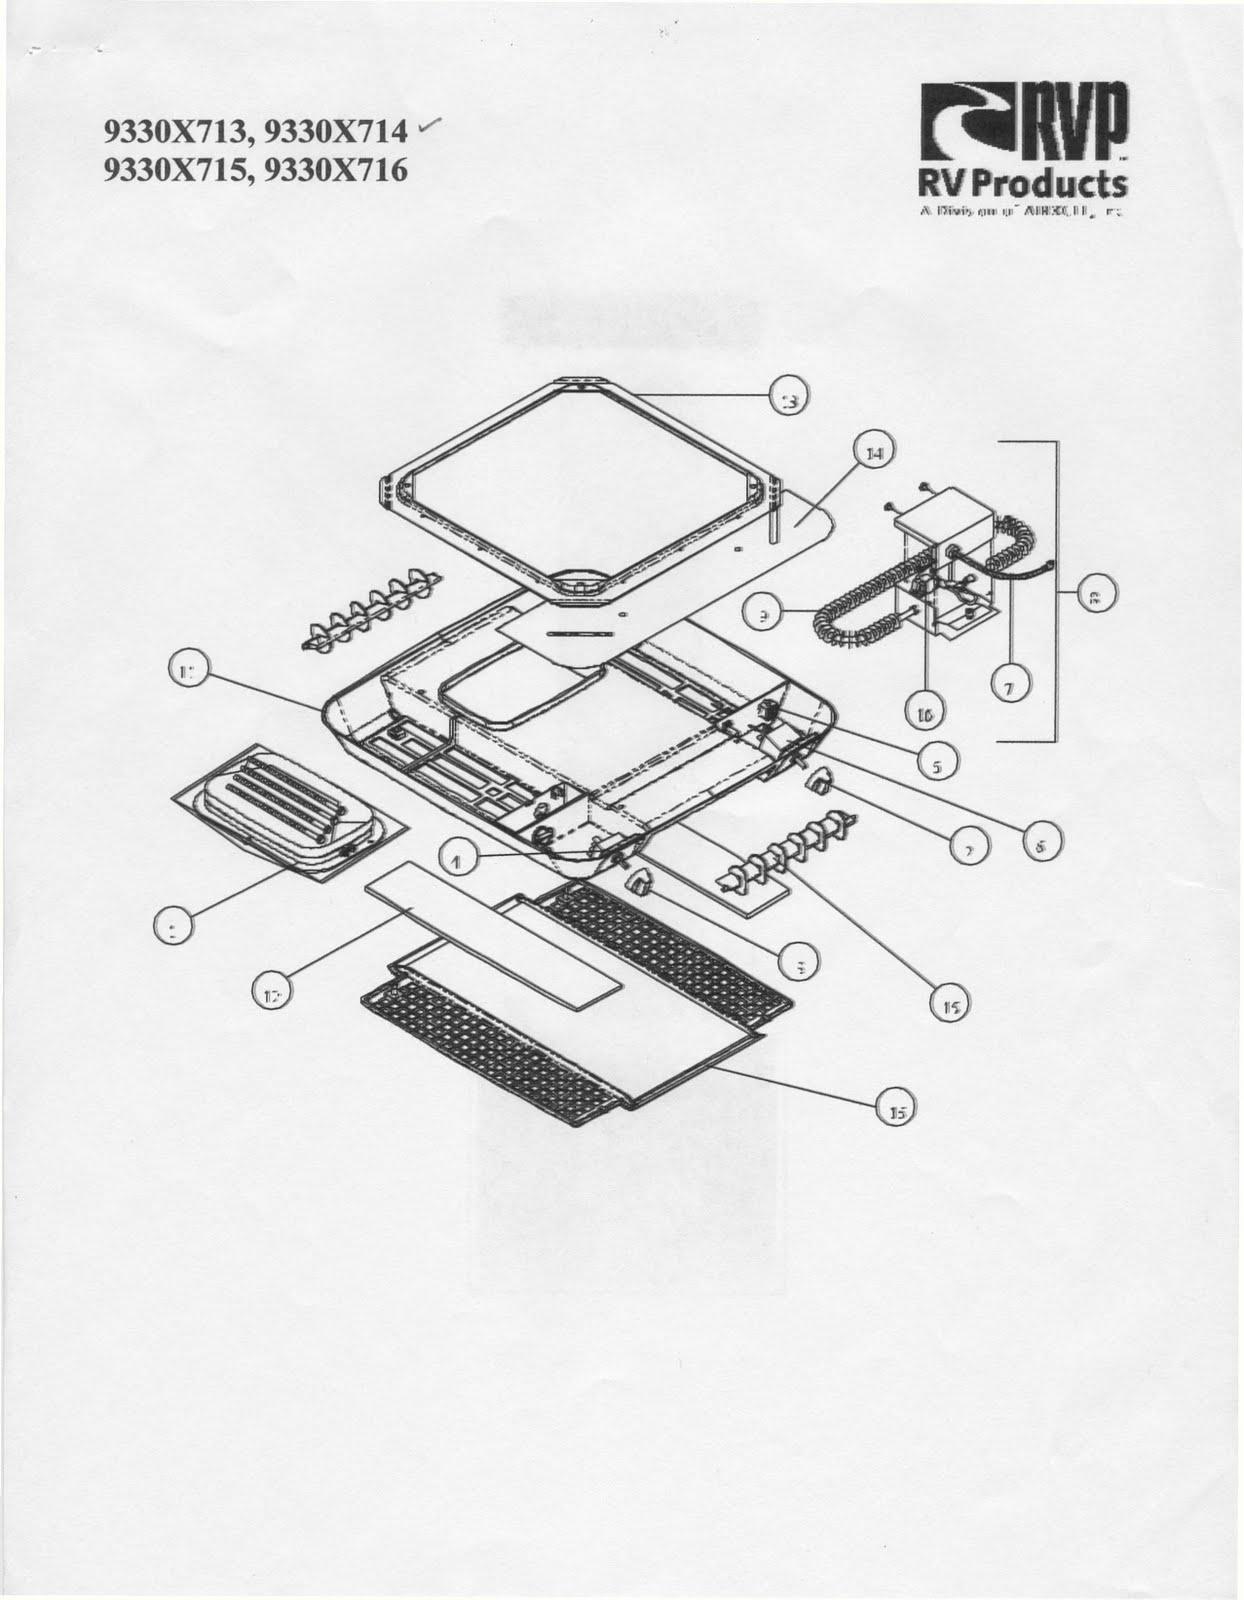 Coleman Rv Air Conditioner Wiring Diagram Rj45 Wall Socket Australia Conditioners